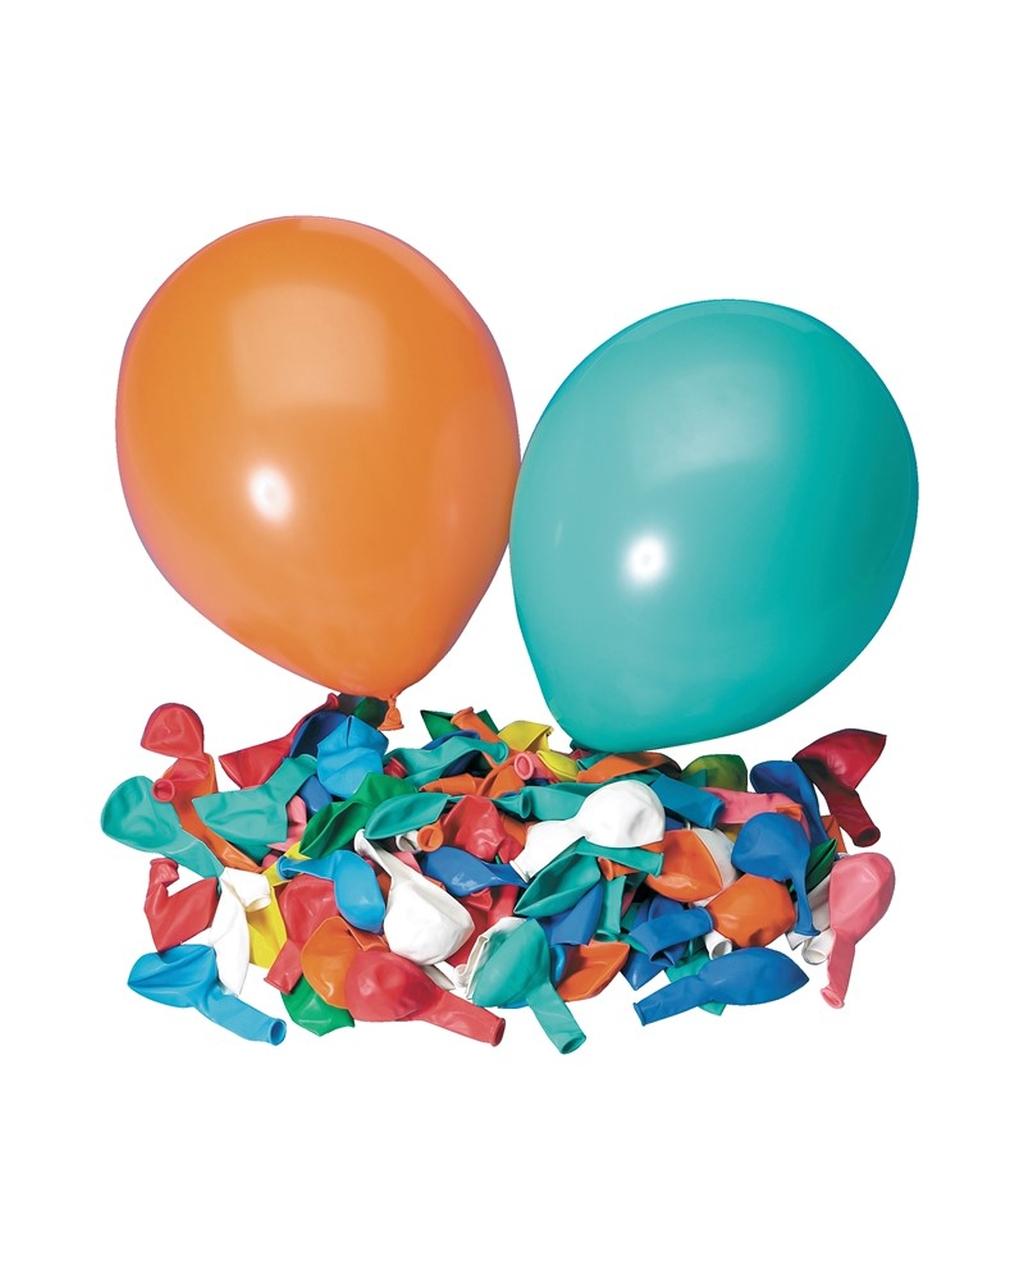 Balloons - Round